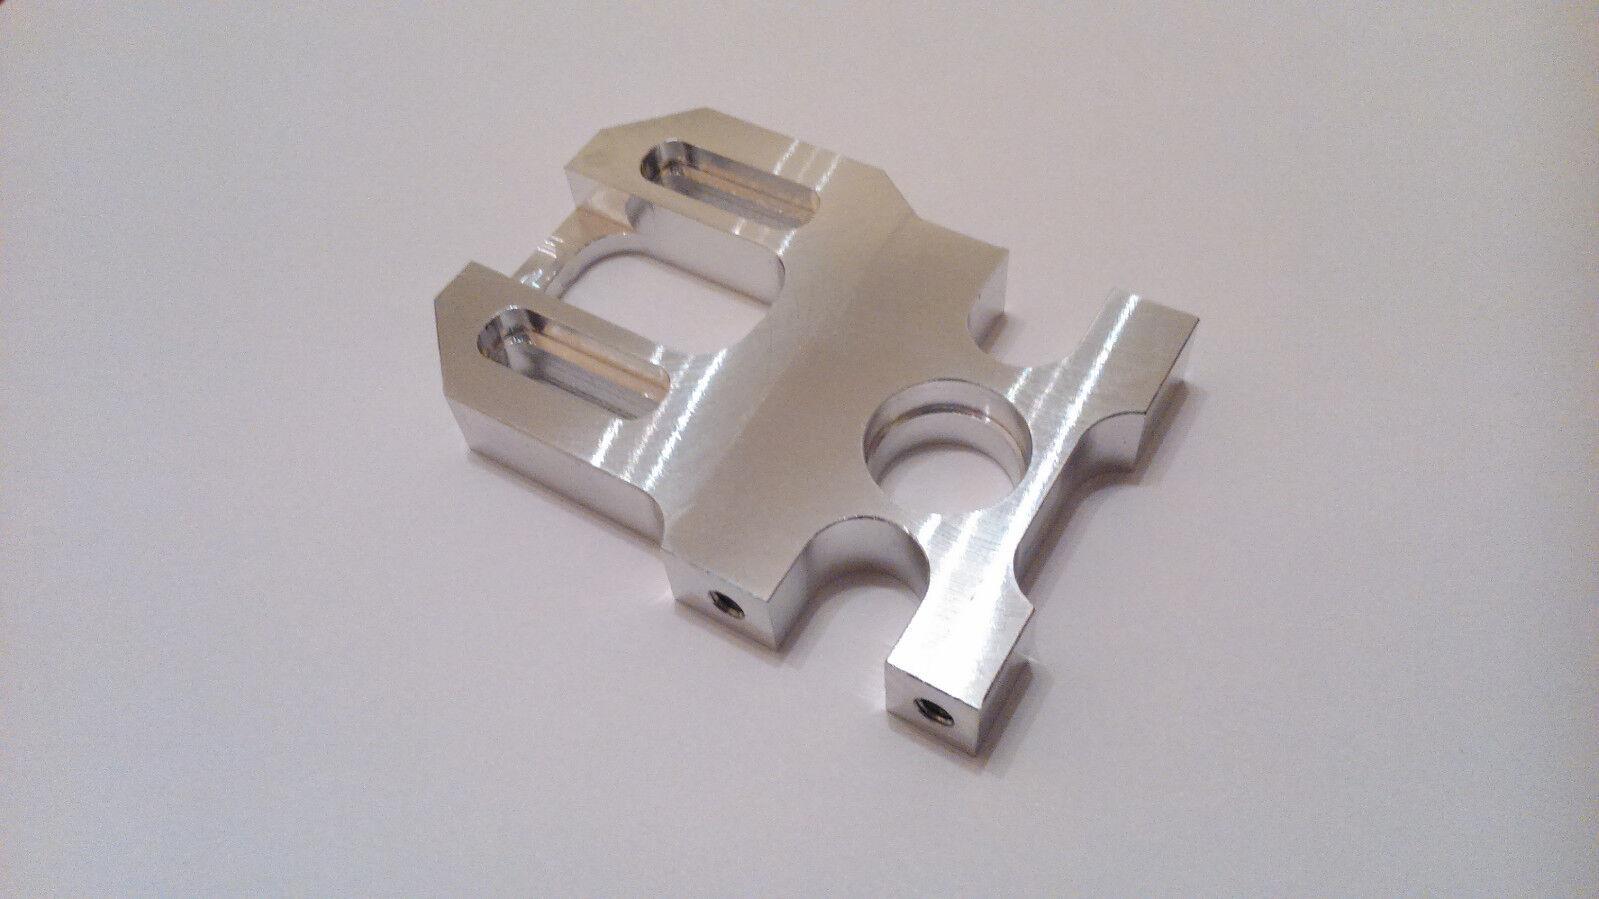 Ofna dm-1 , crt x2  brushless conversion motor mount  for 1/5 size motors